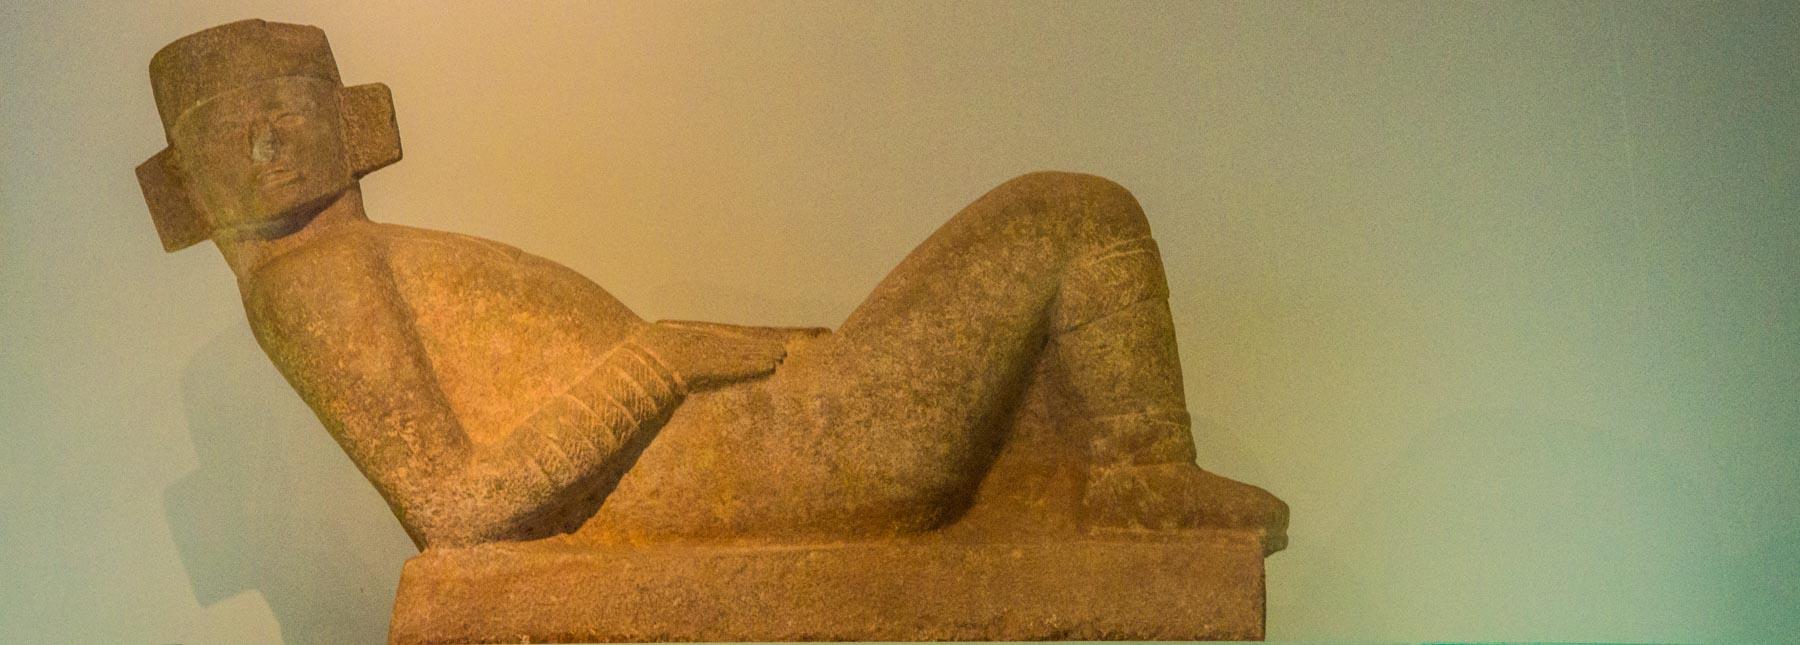 A chac-mool sculpture.